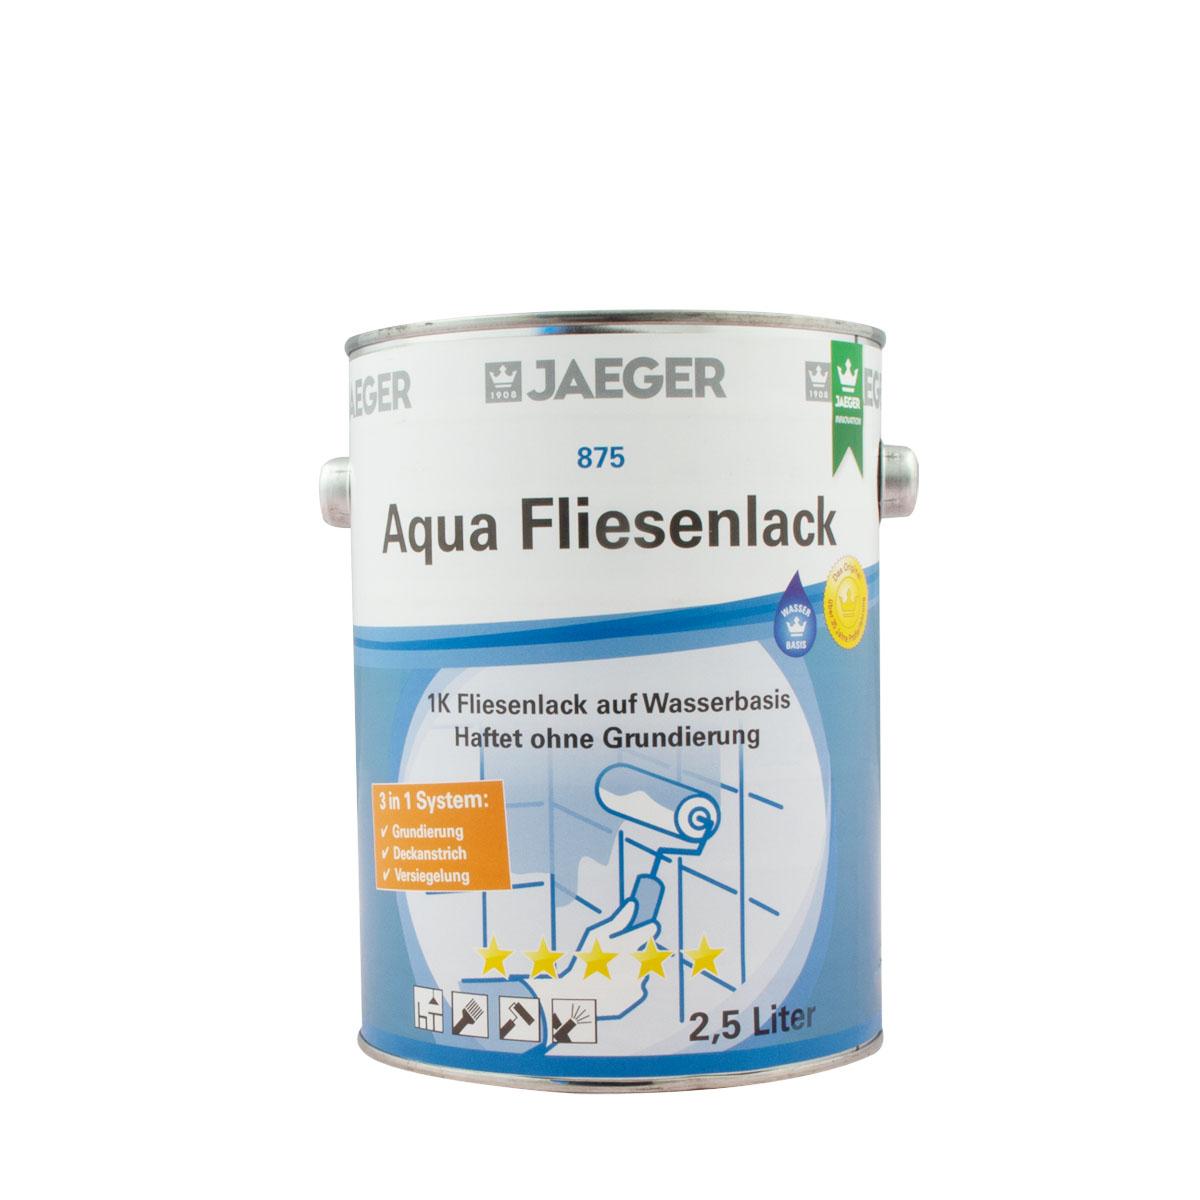 Jaeger Aqua Fliesenlack 875 neve (weiss) 2,5l, 3 in 1 System